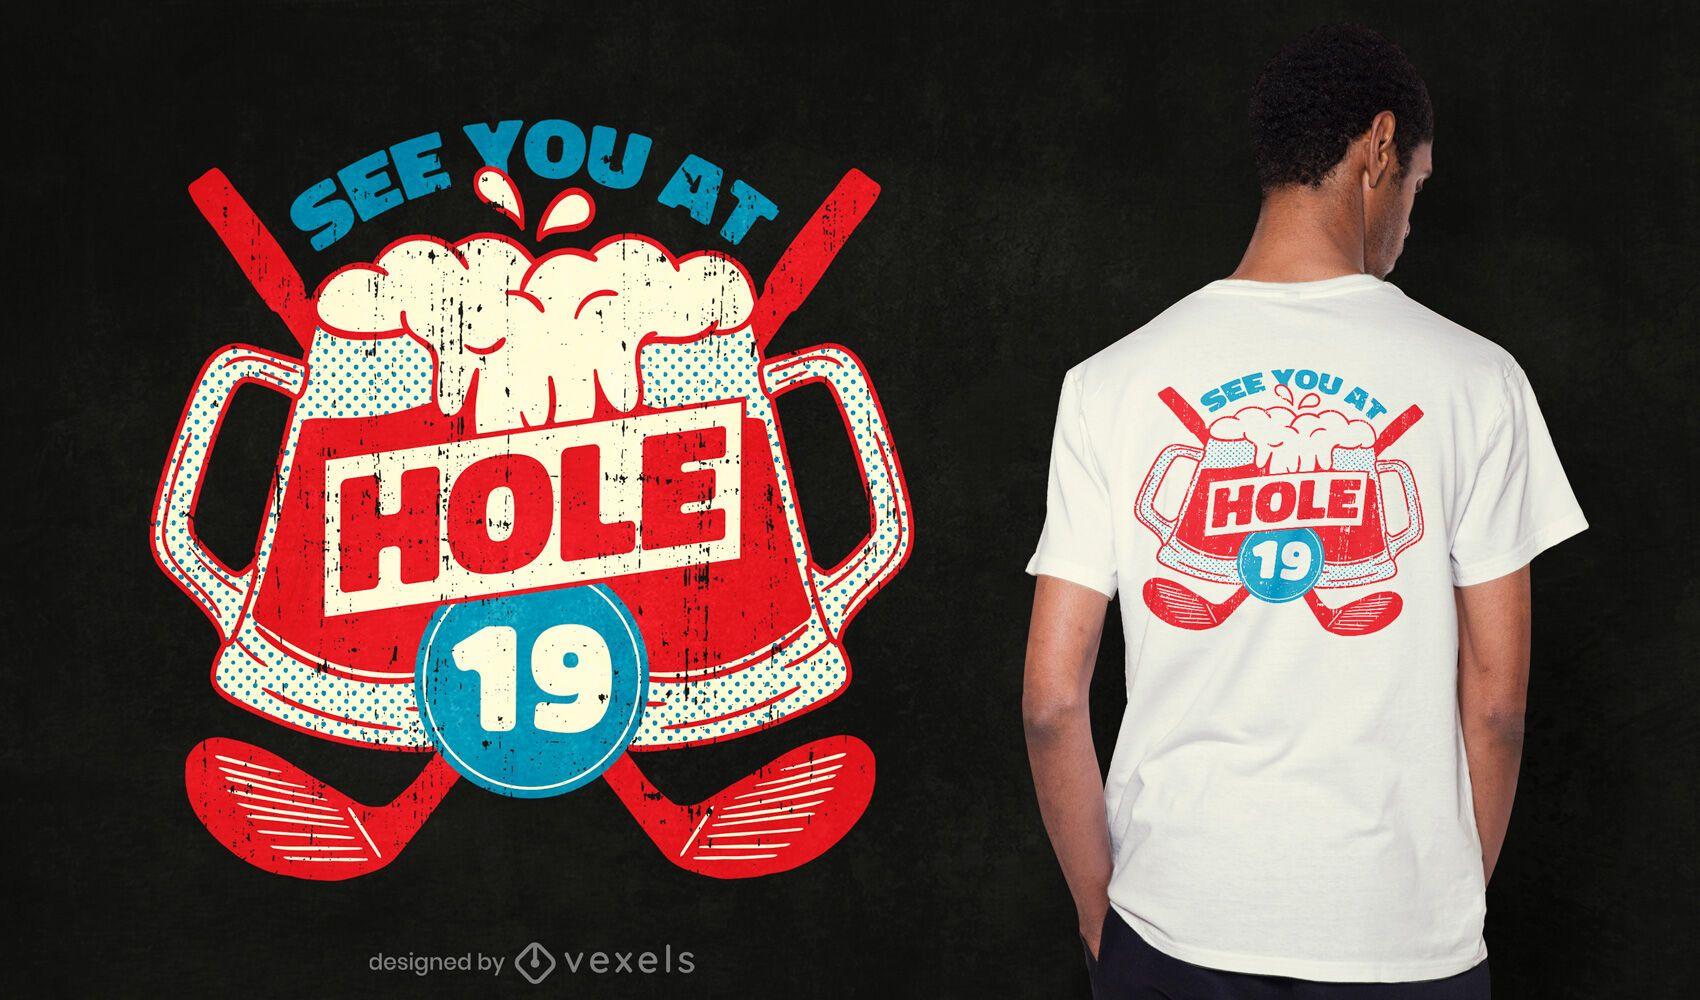 Design de camiseta de golfe Hole 19